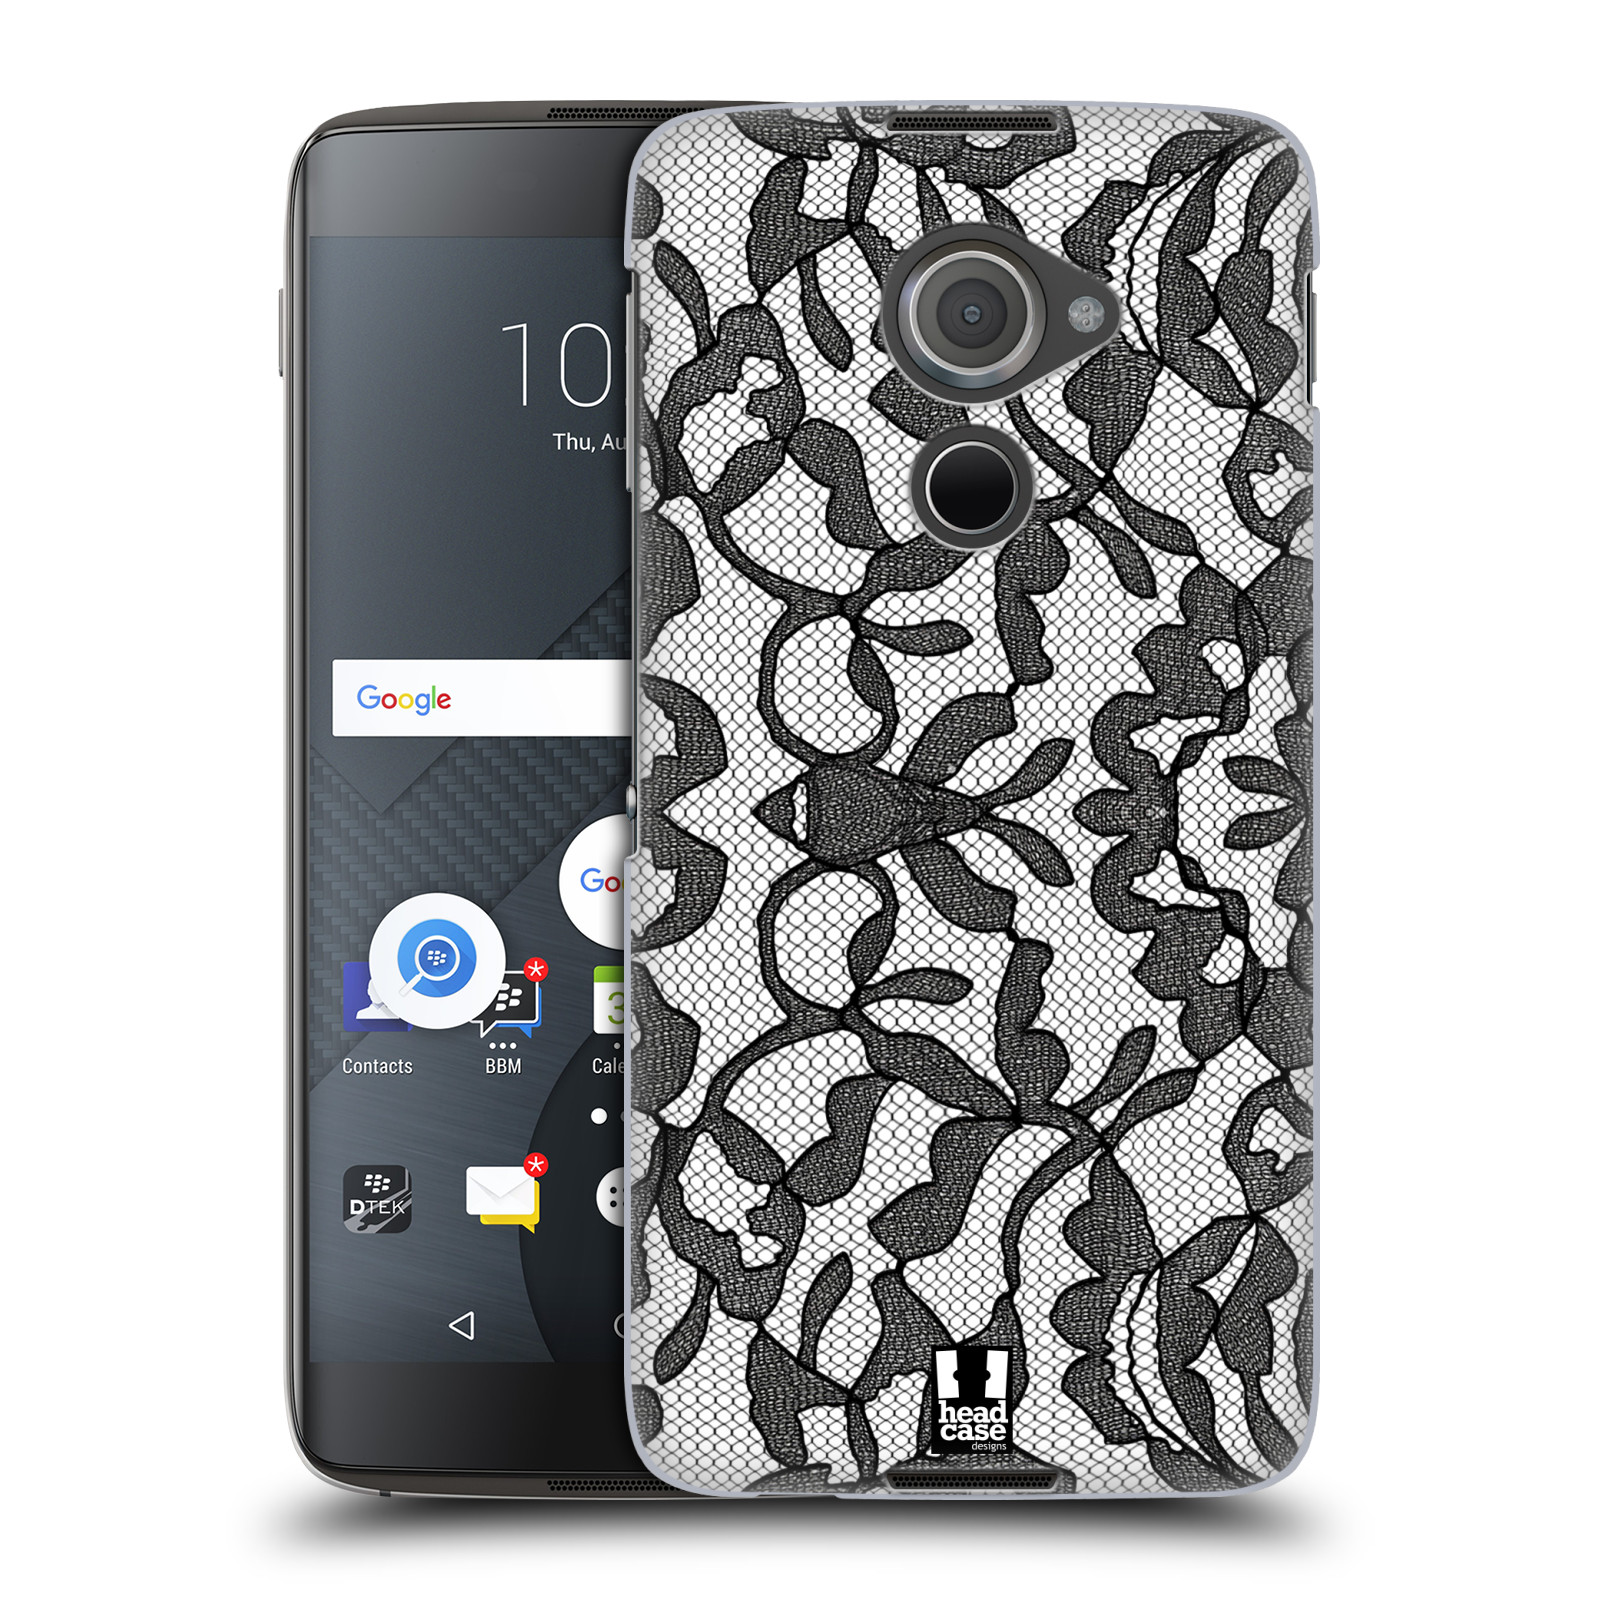 Plastové pouzdro na mobil Blackberry DTEK60 (Argon) - Head Case LEAFY KRAJKA